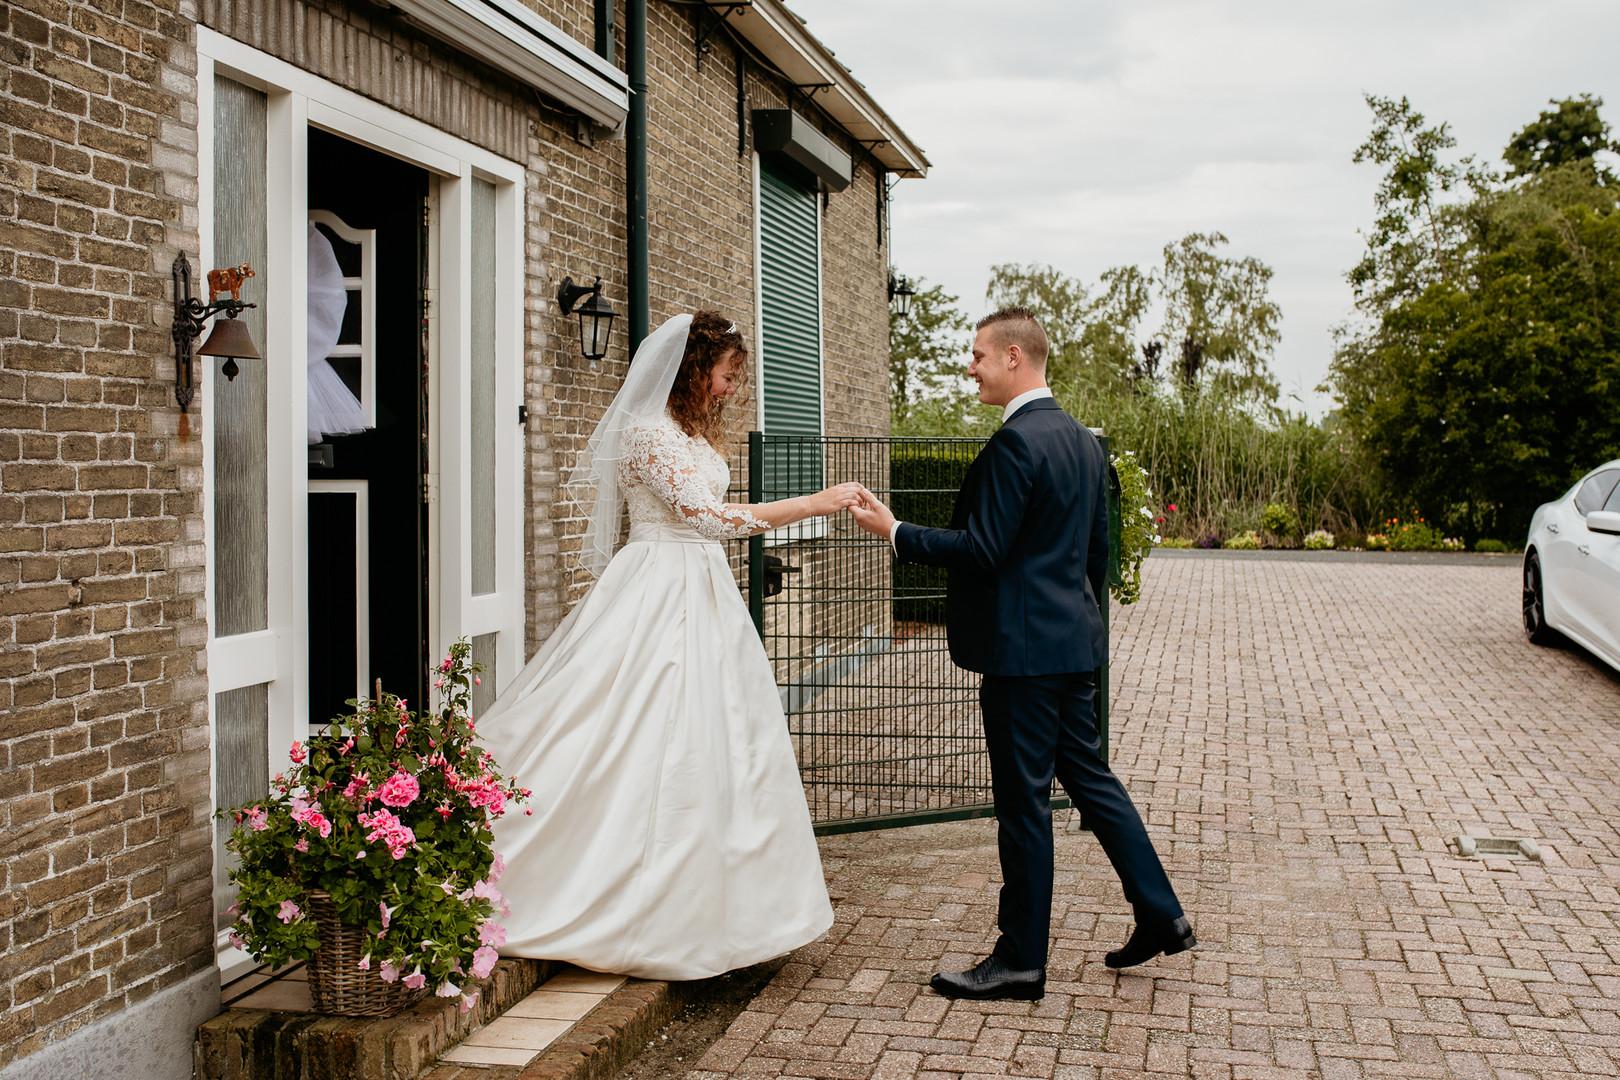 Bruiloft Oud-Alblas